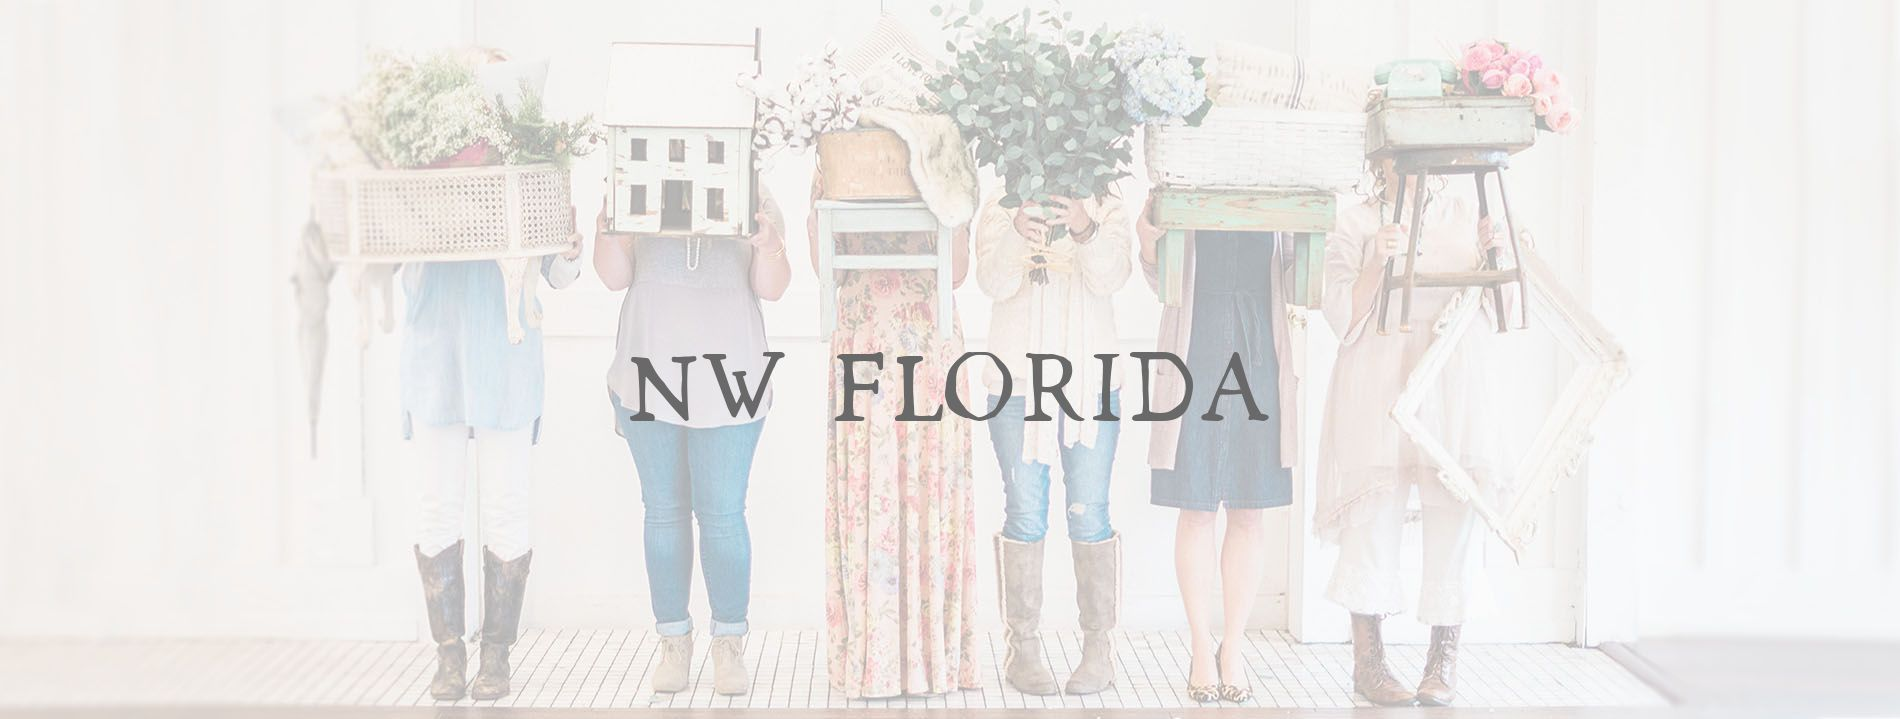 NW Florida